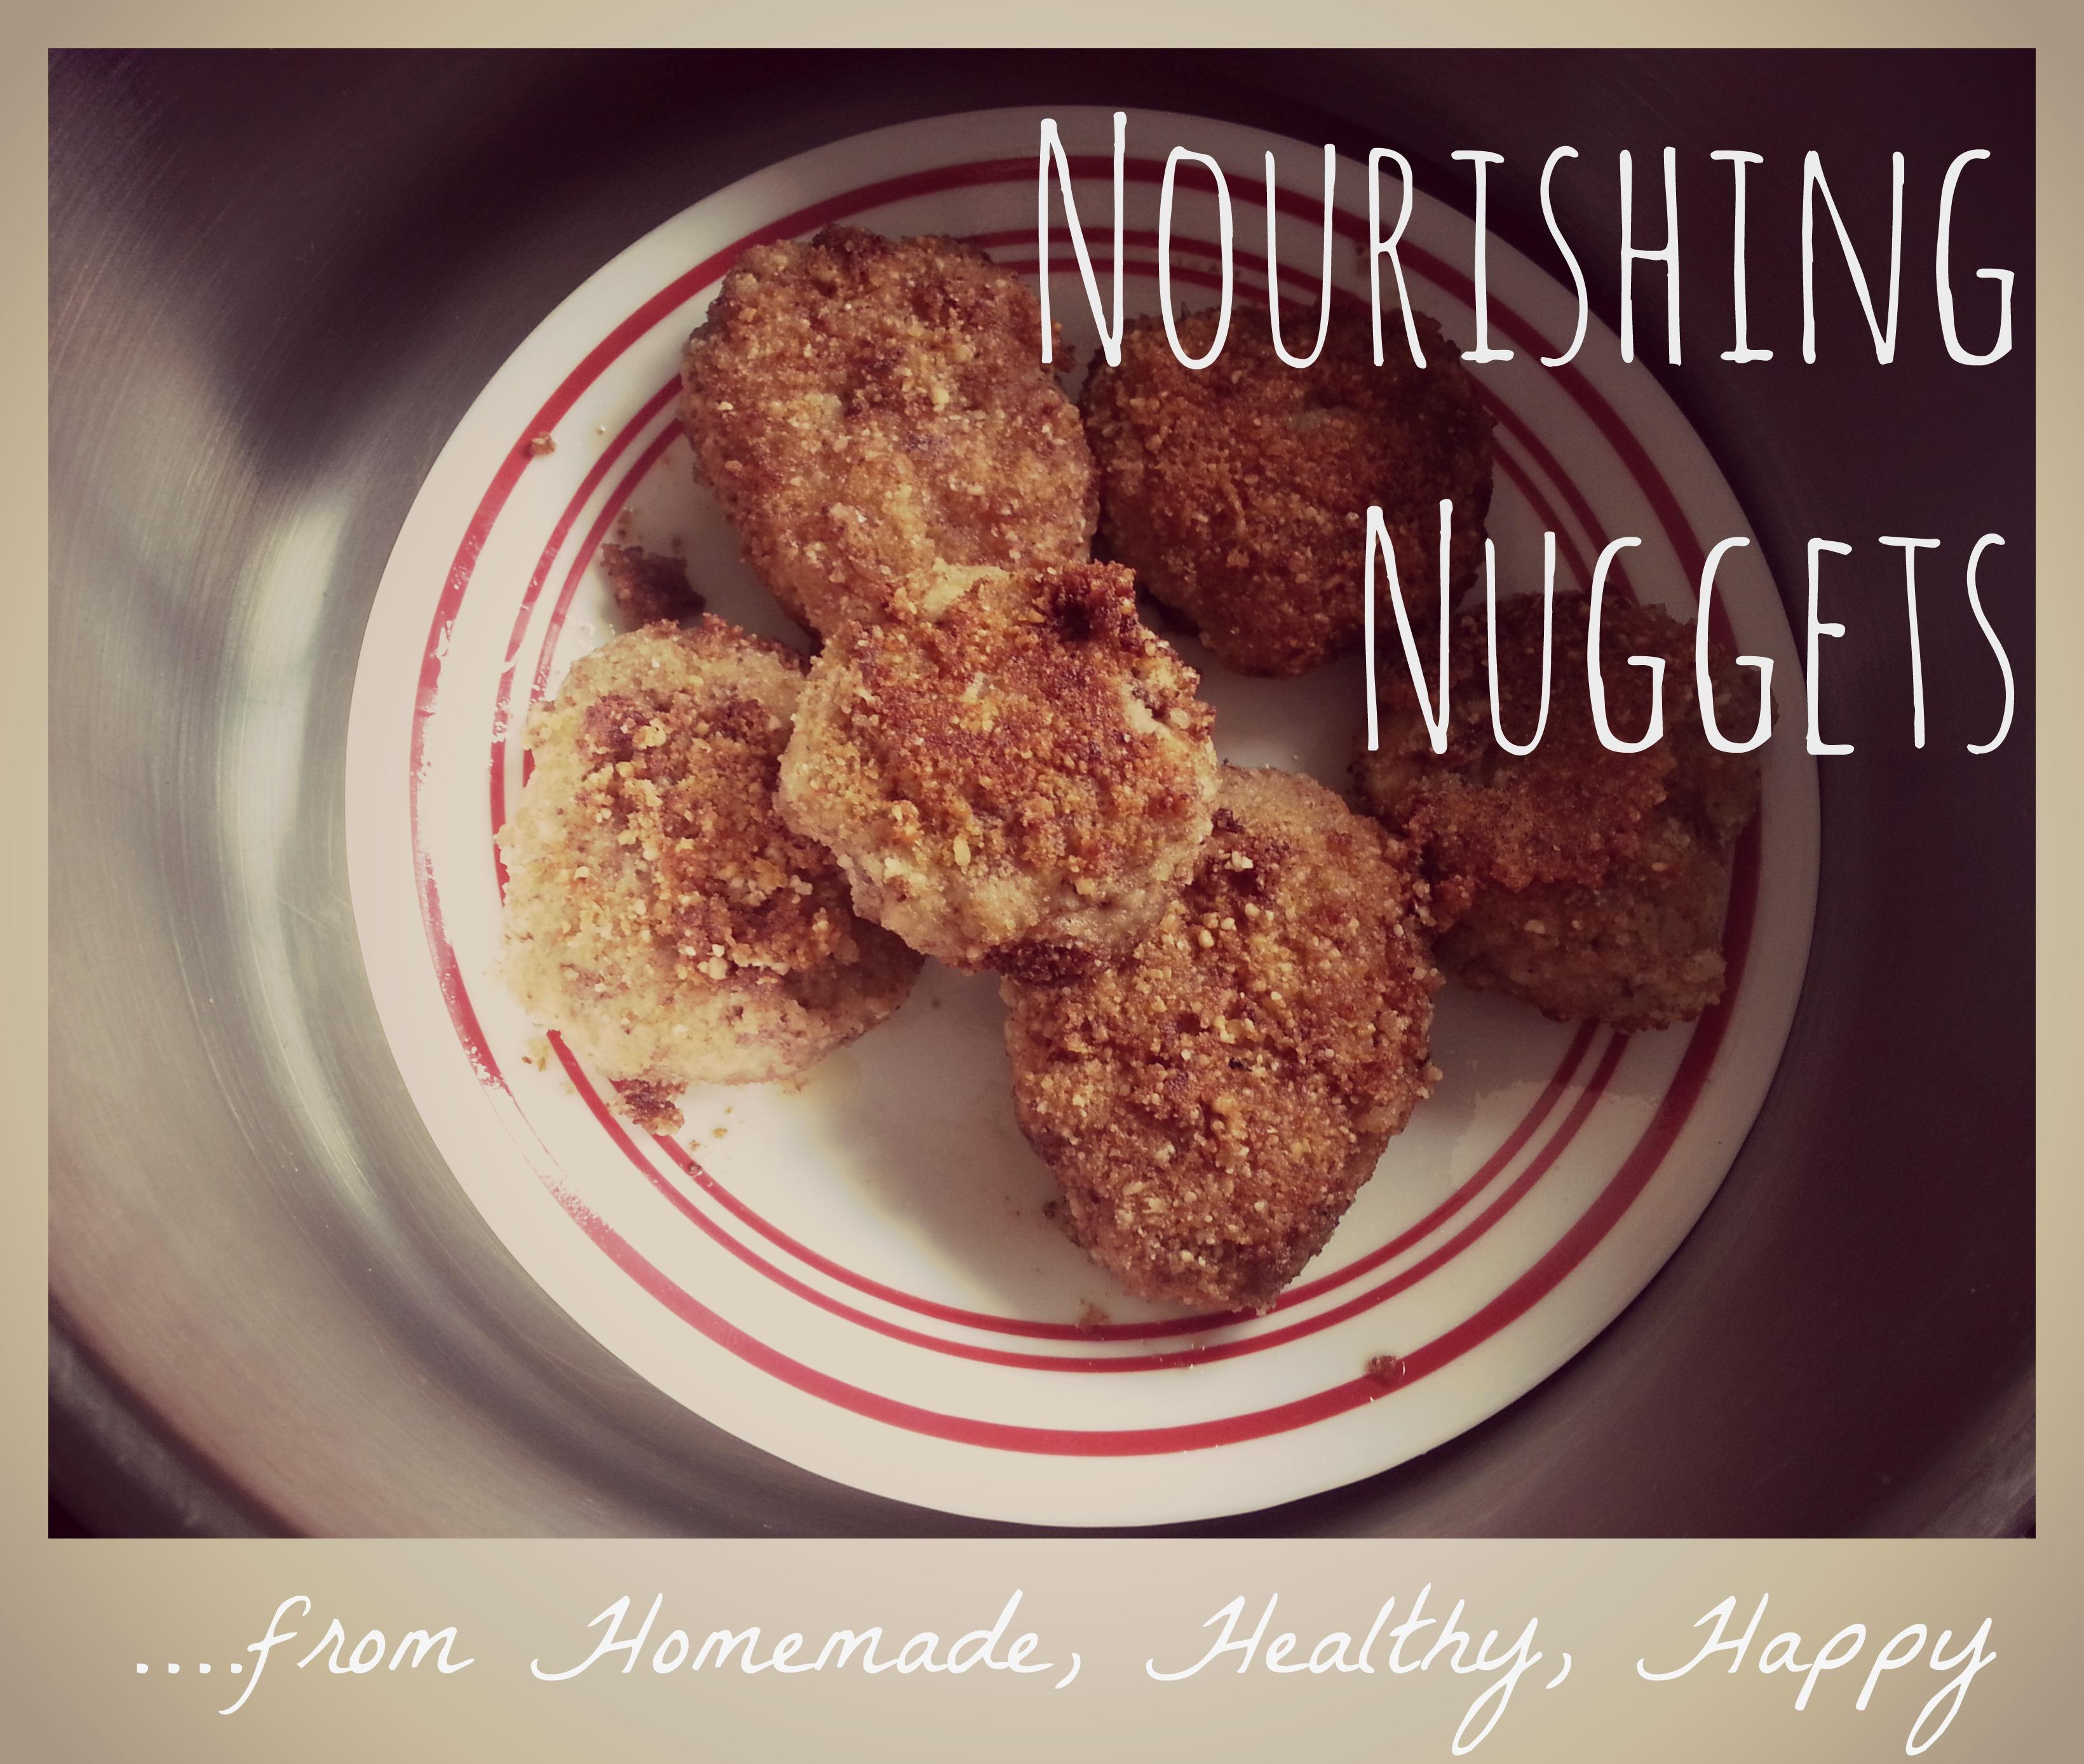 nourishing nuggets